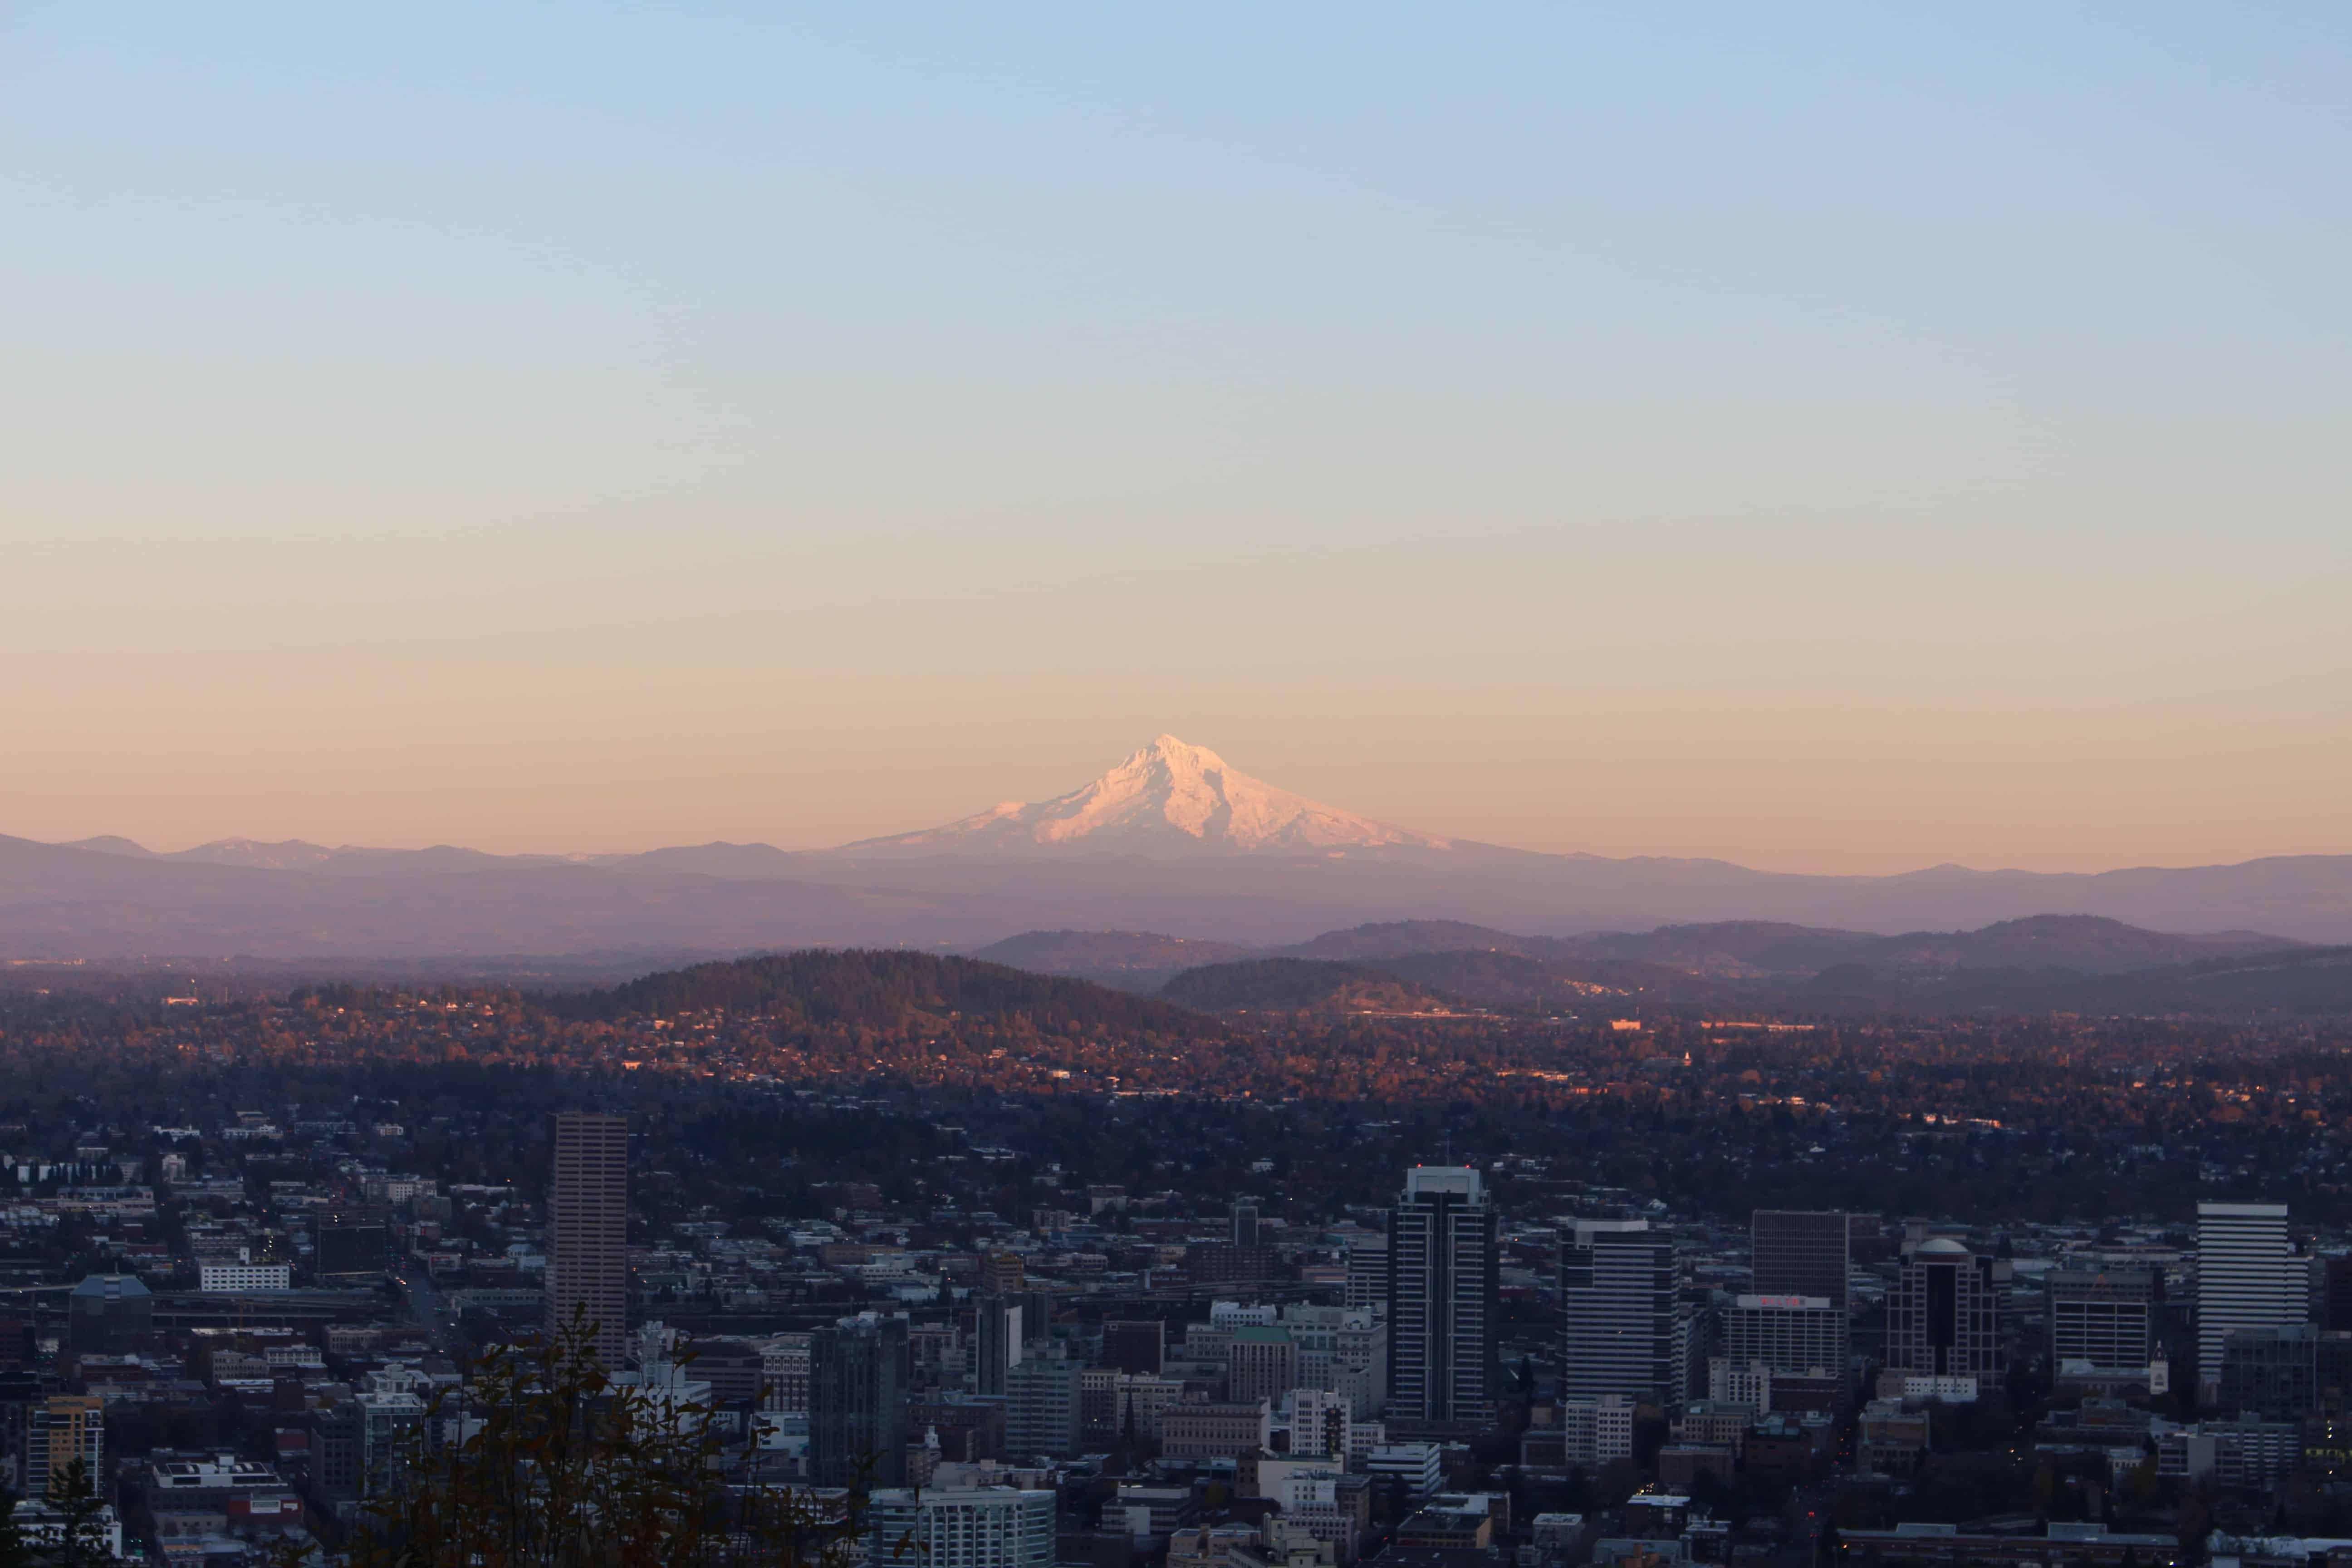 Mount Hood Portland Oregon PersonalProfitability.com